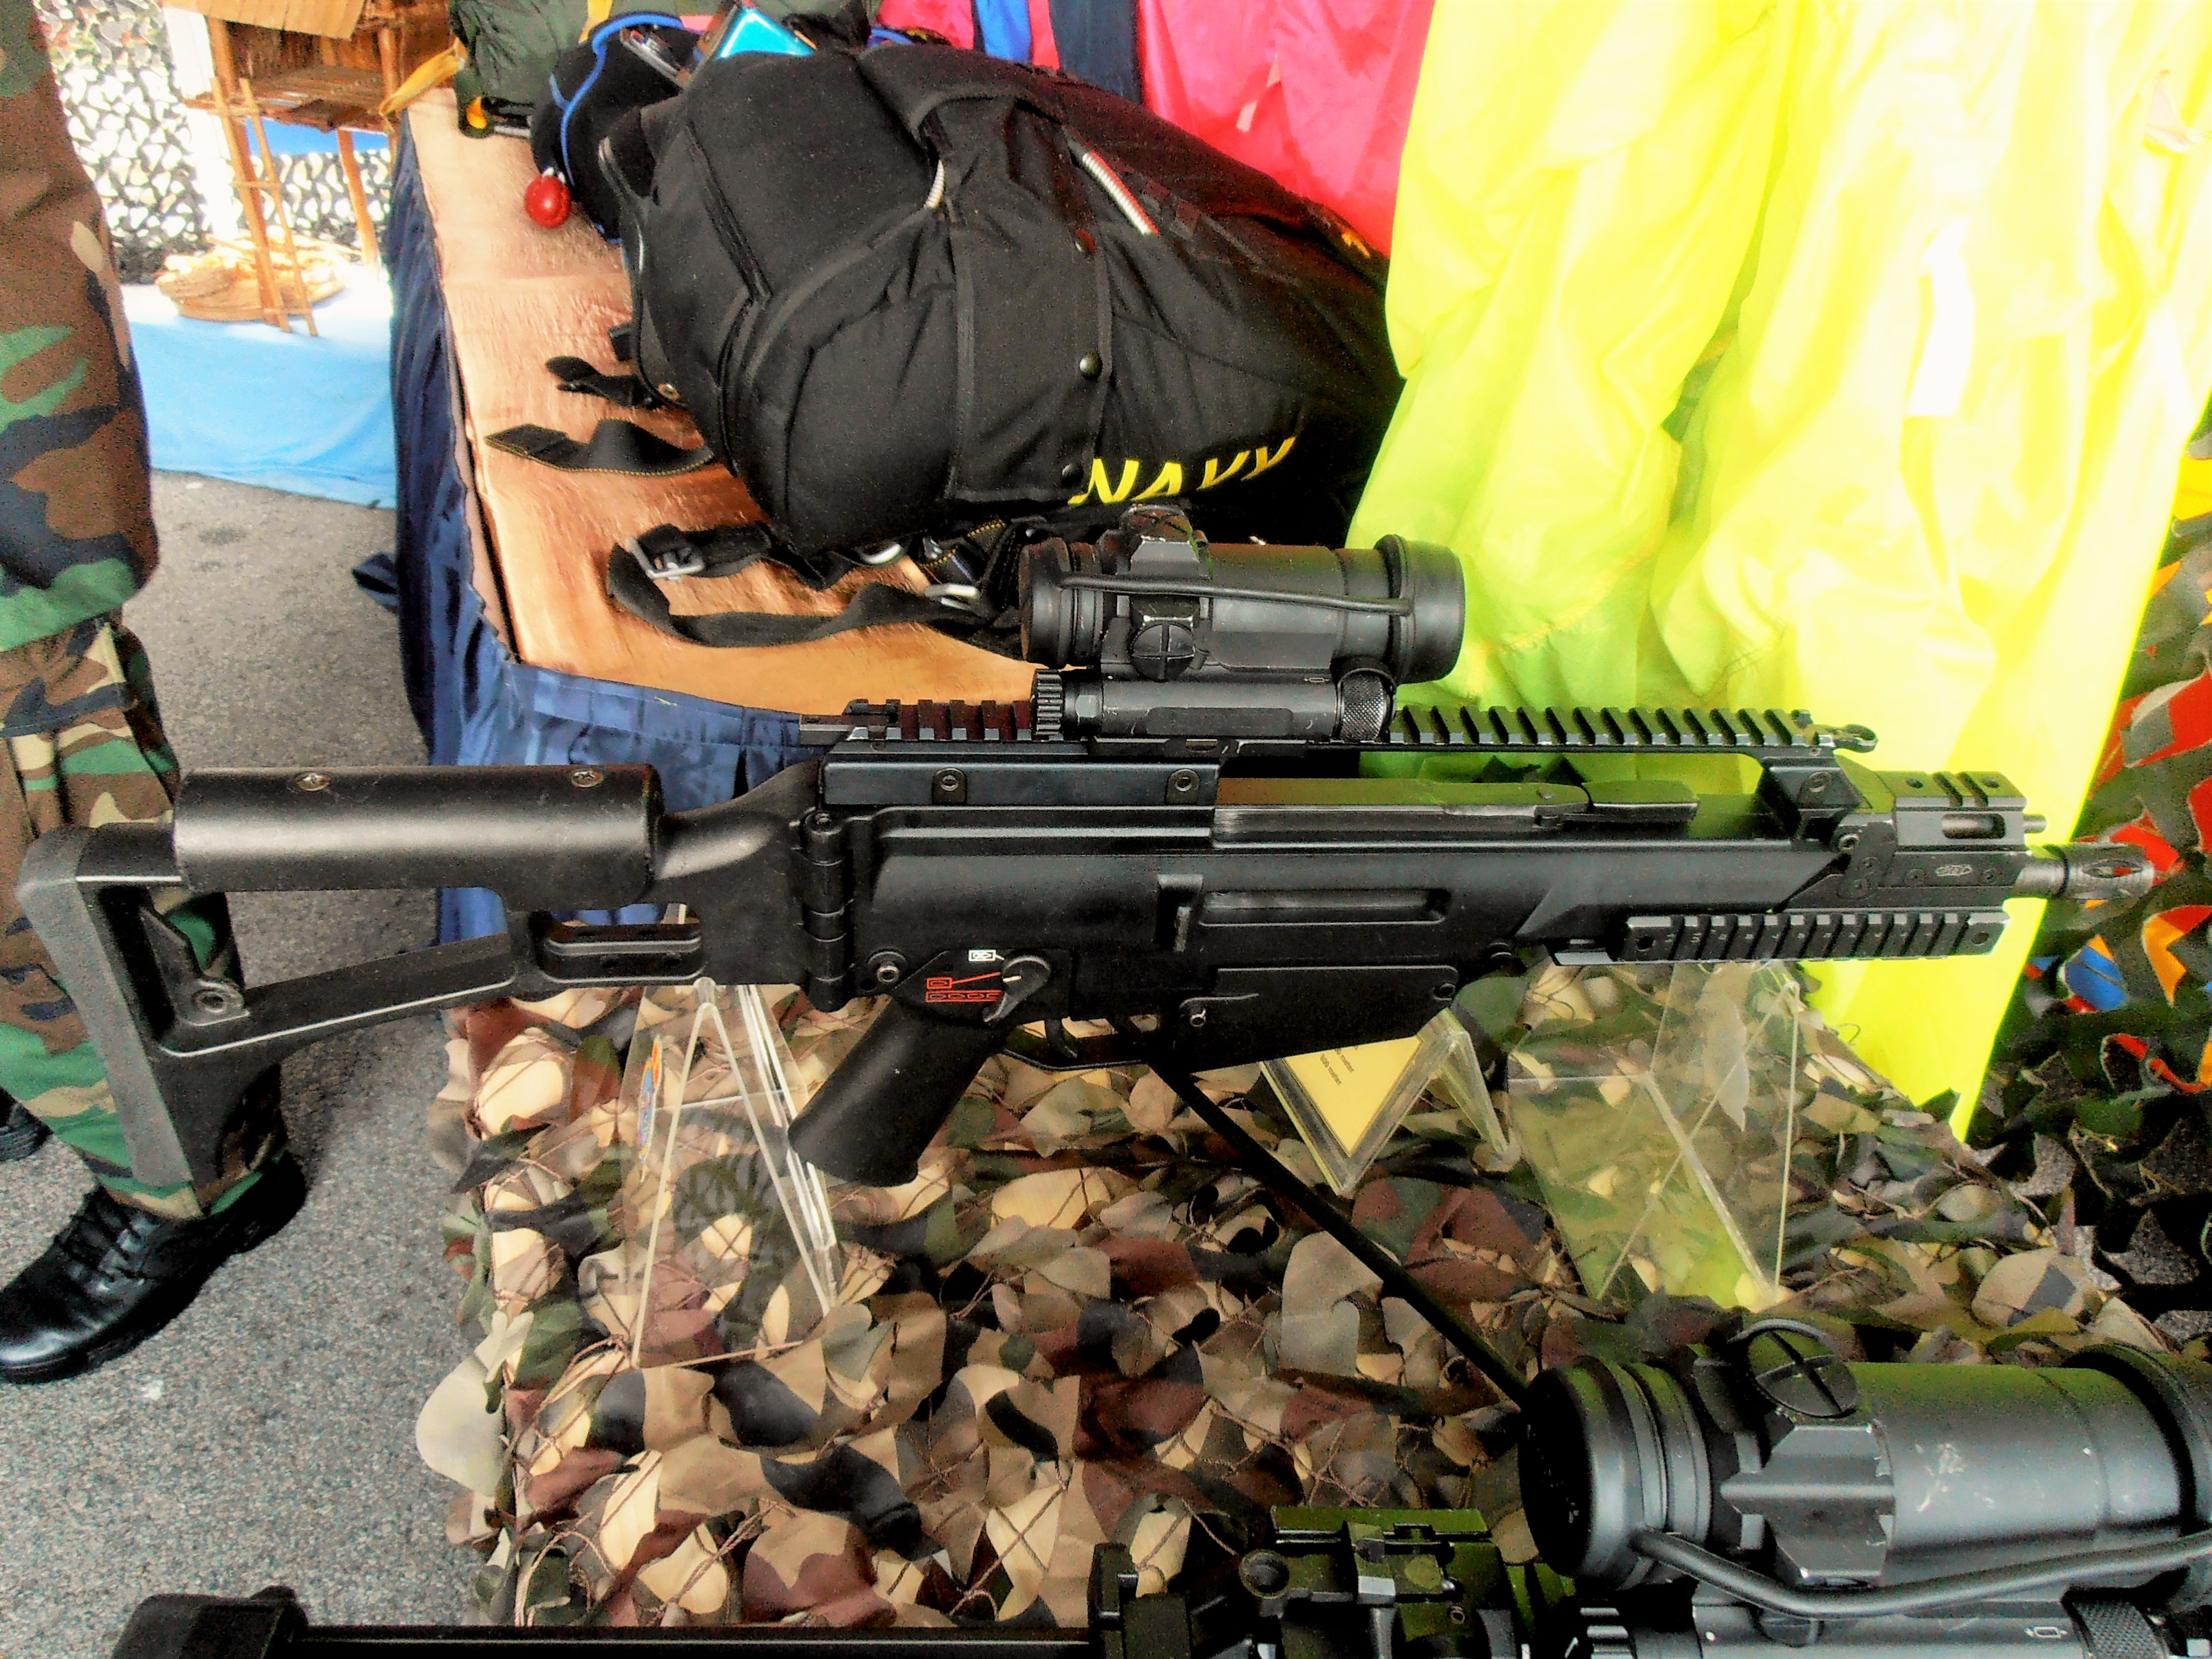 Xm8 Compact Carbine File:H&K G36 Compa...